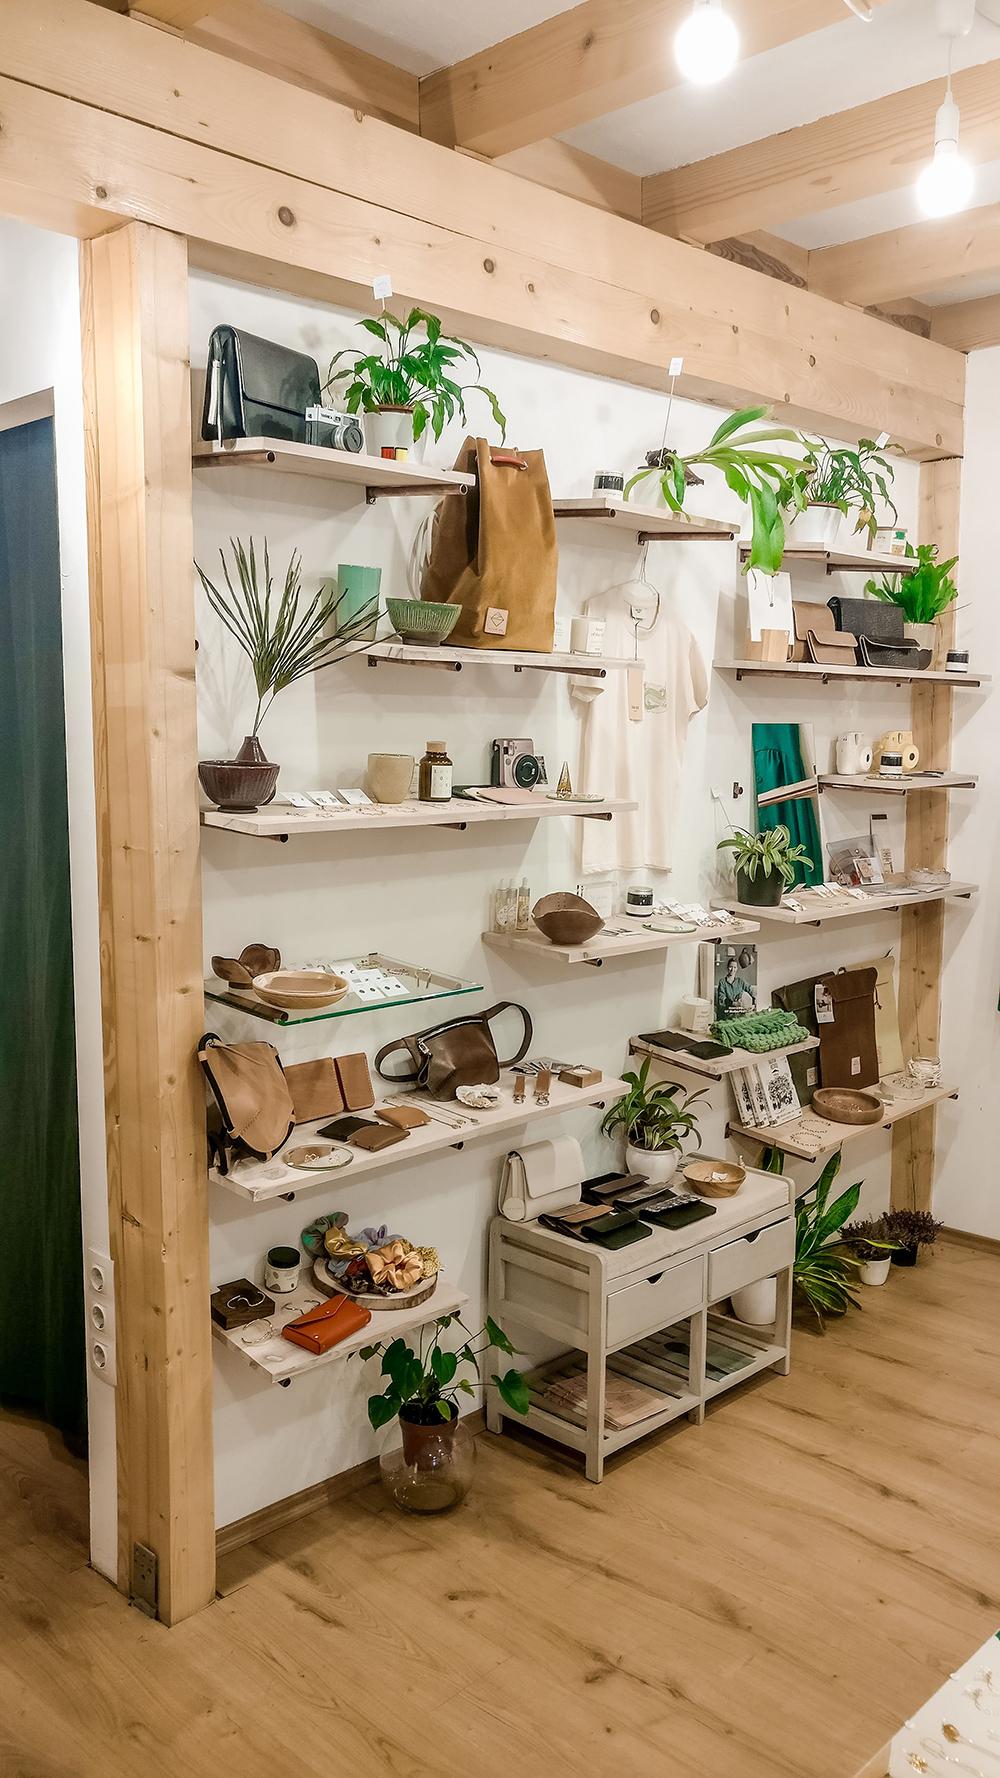 Repertory Concept Store - Budapest design shop guide to best Hungarian souvenirs | Aliz's Wonderland